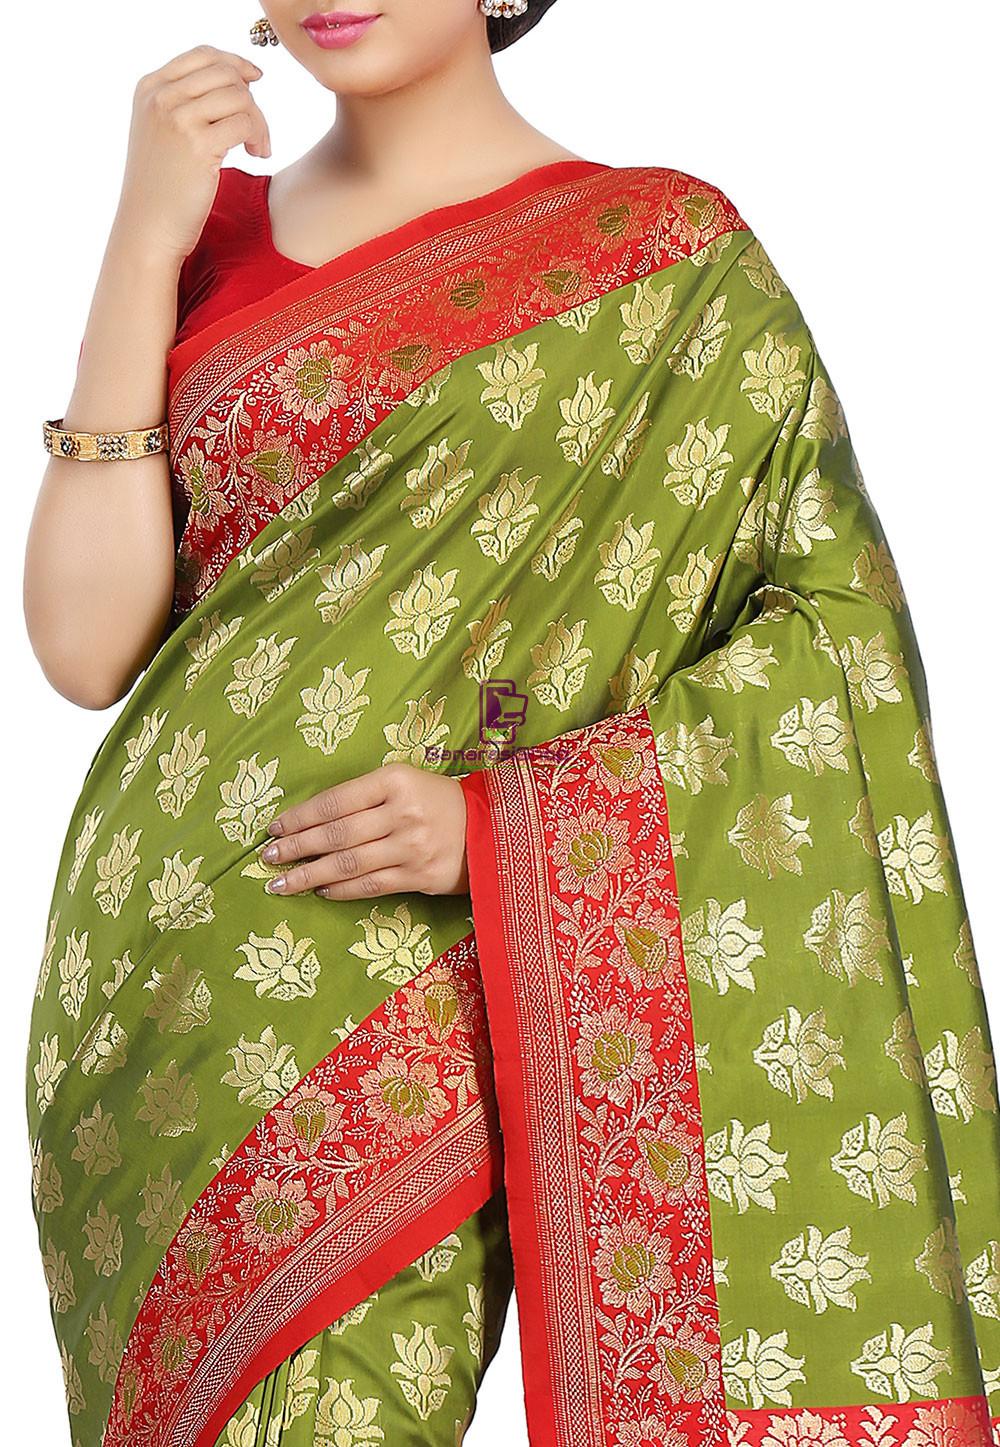 Woven Banarasi Art Silk Saree in Olive Green and Red 3